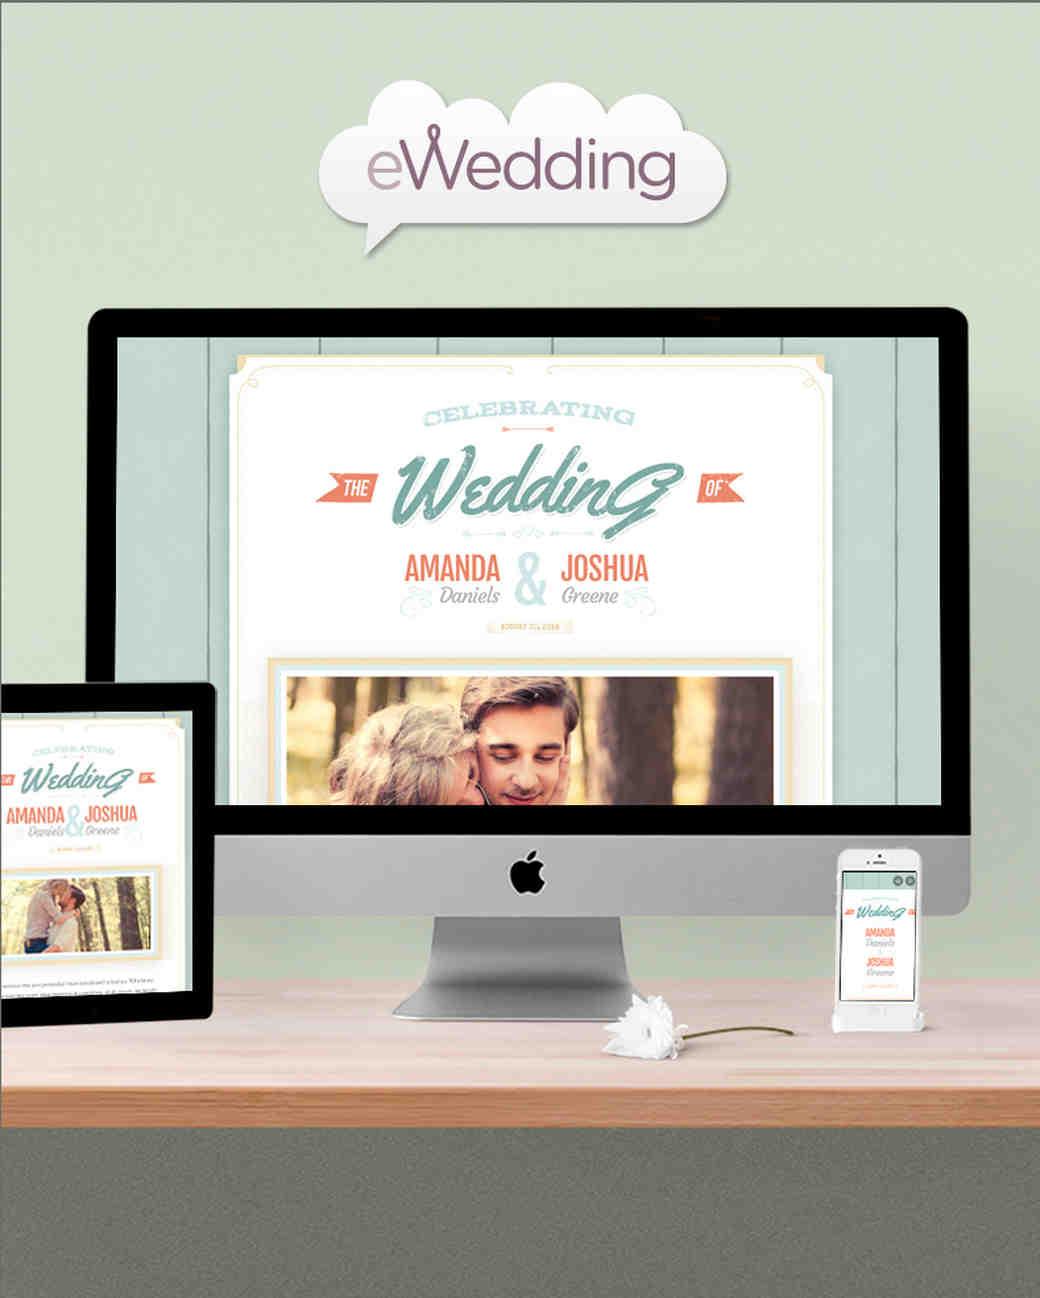 best-wedding-websites-ewedding-0615.jpg